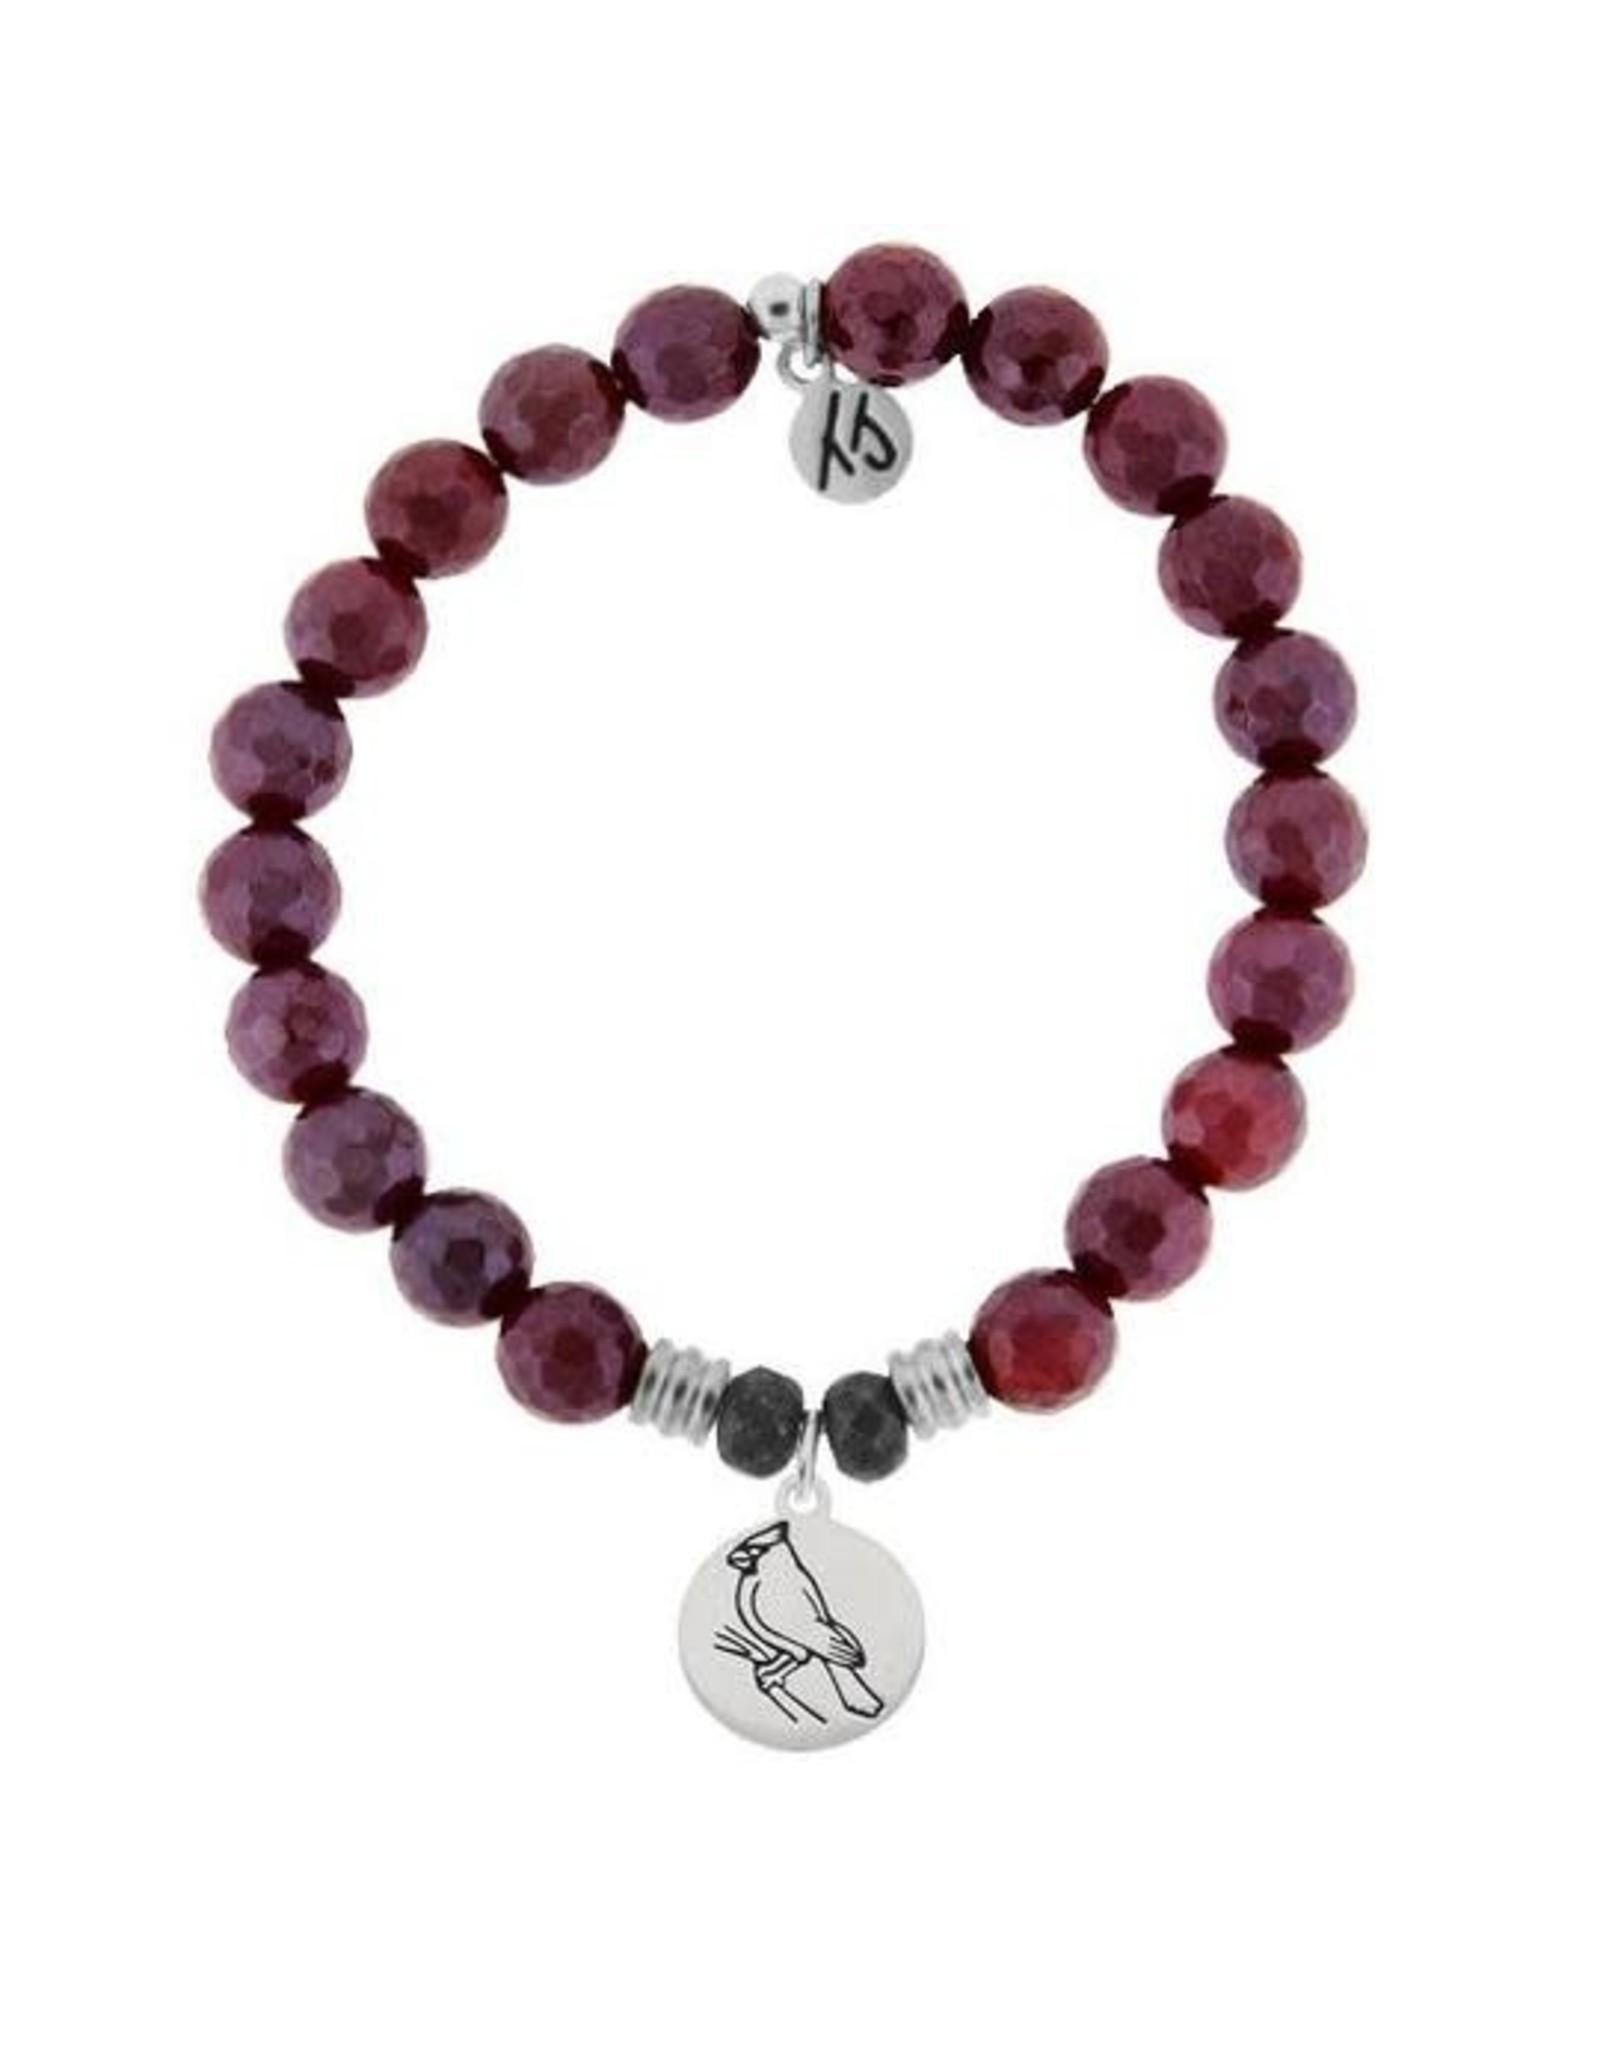 Cardinal Red Ruby Agate Bracelet